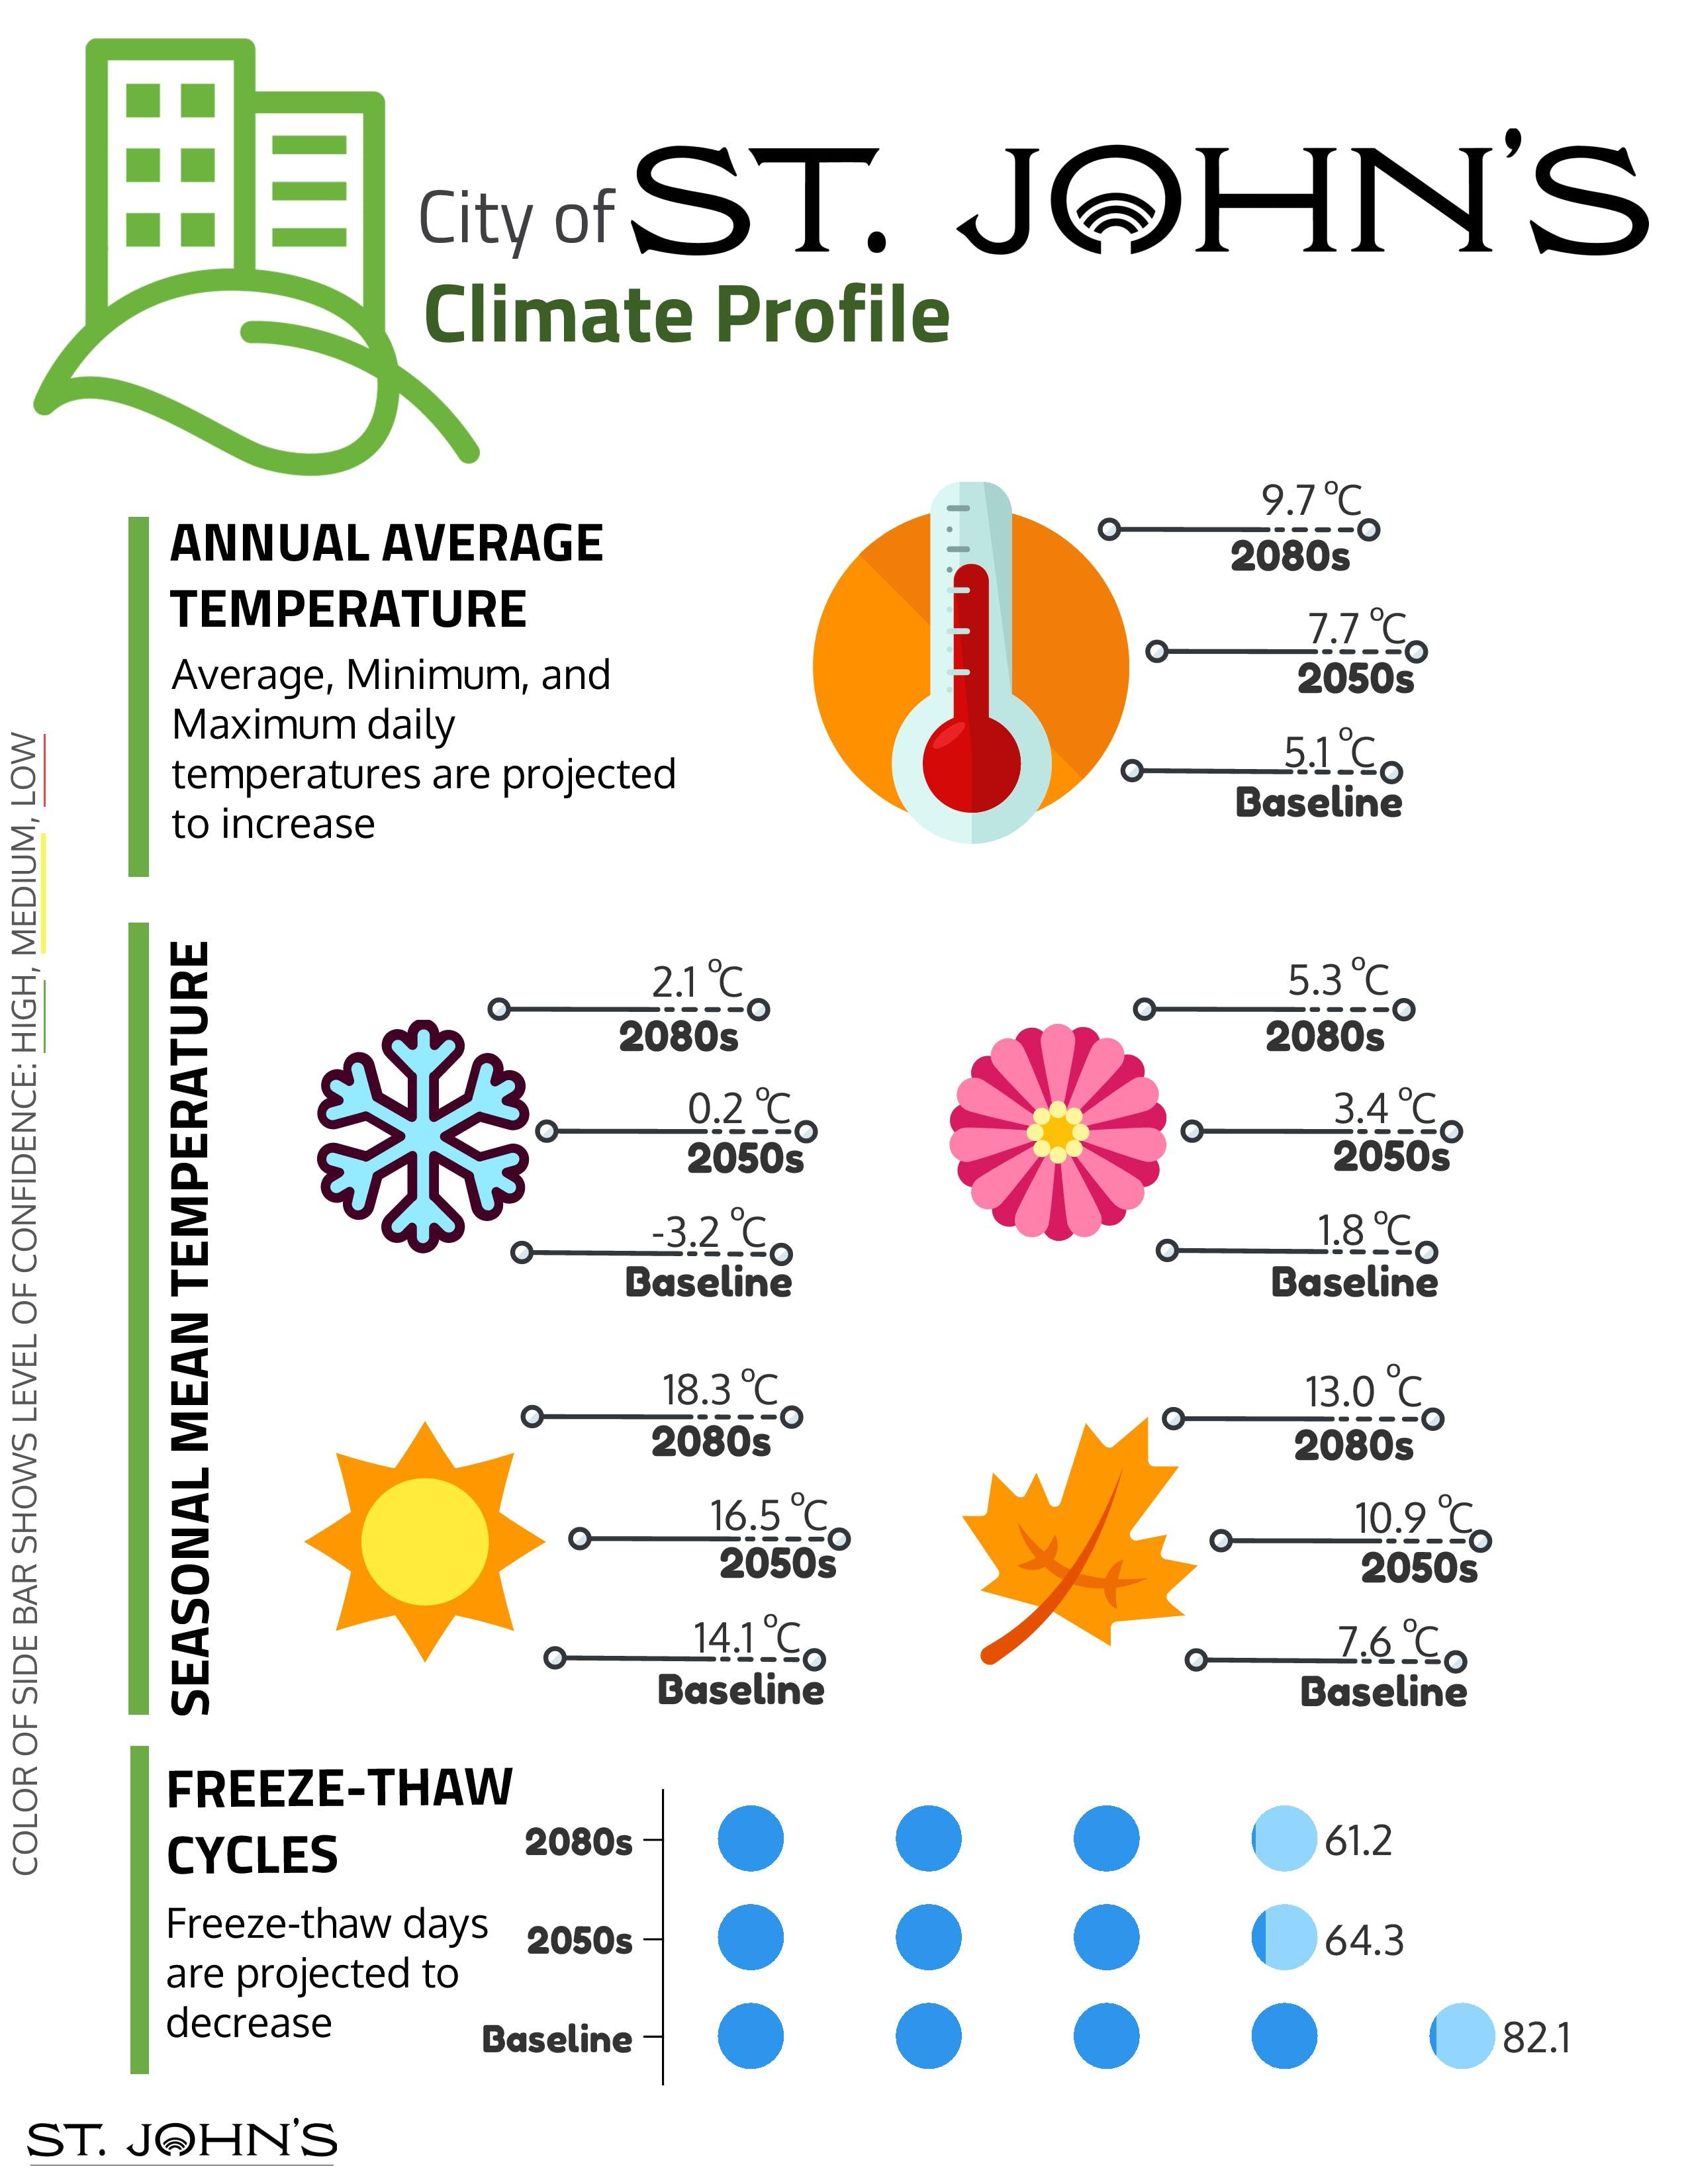 St. John's Climate Profile - Temperature